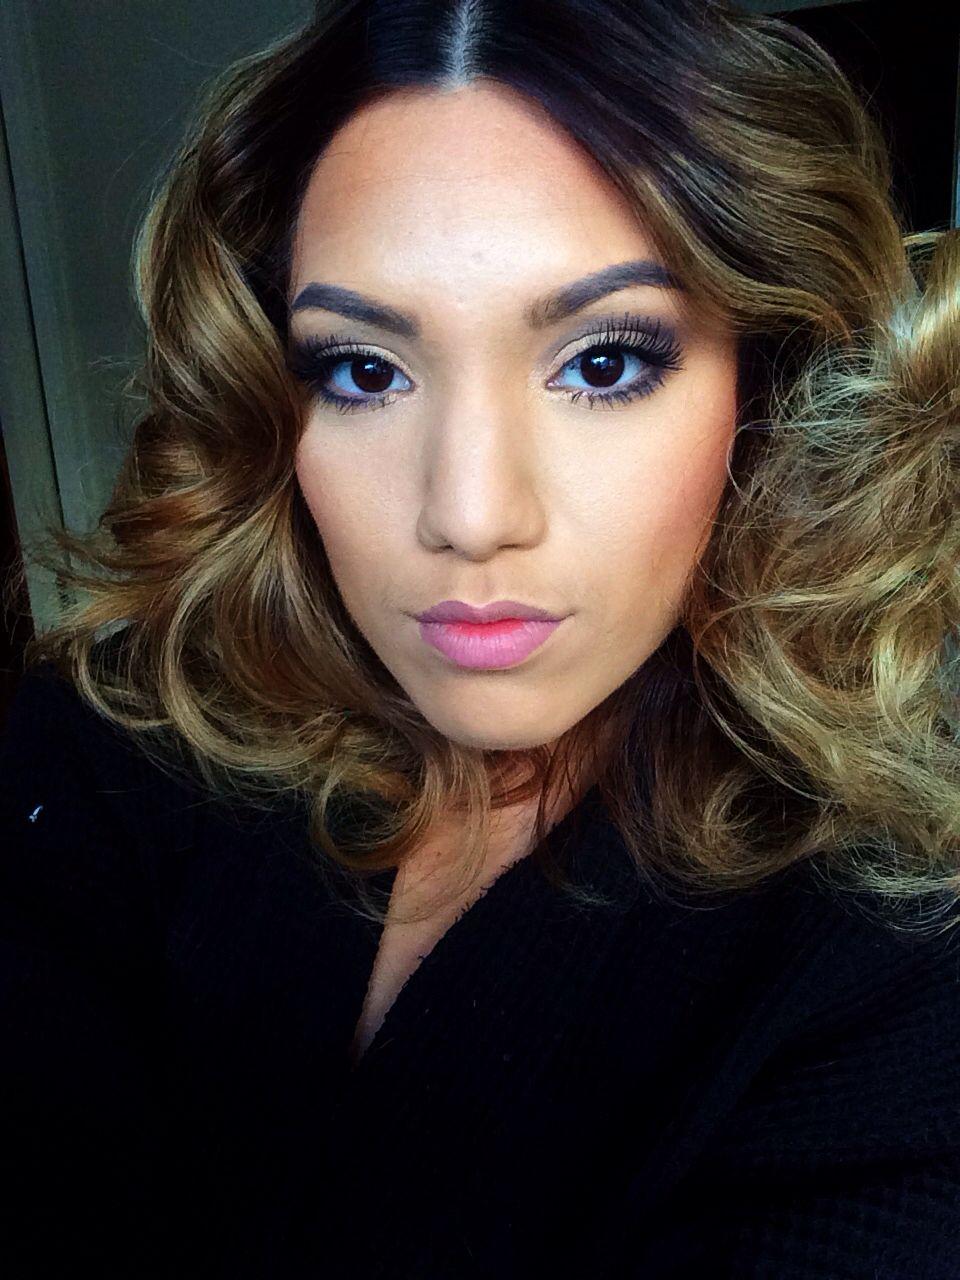 Soft makeup. Big hair natural blonde brown ombré sombre